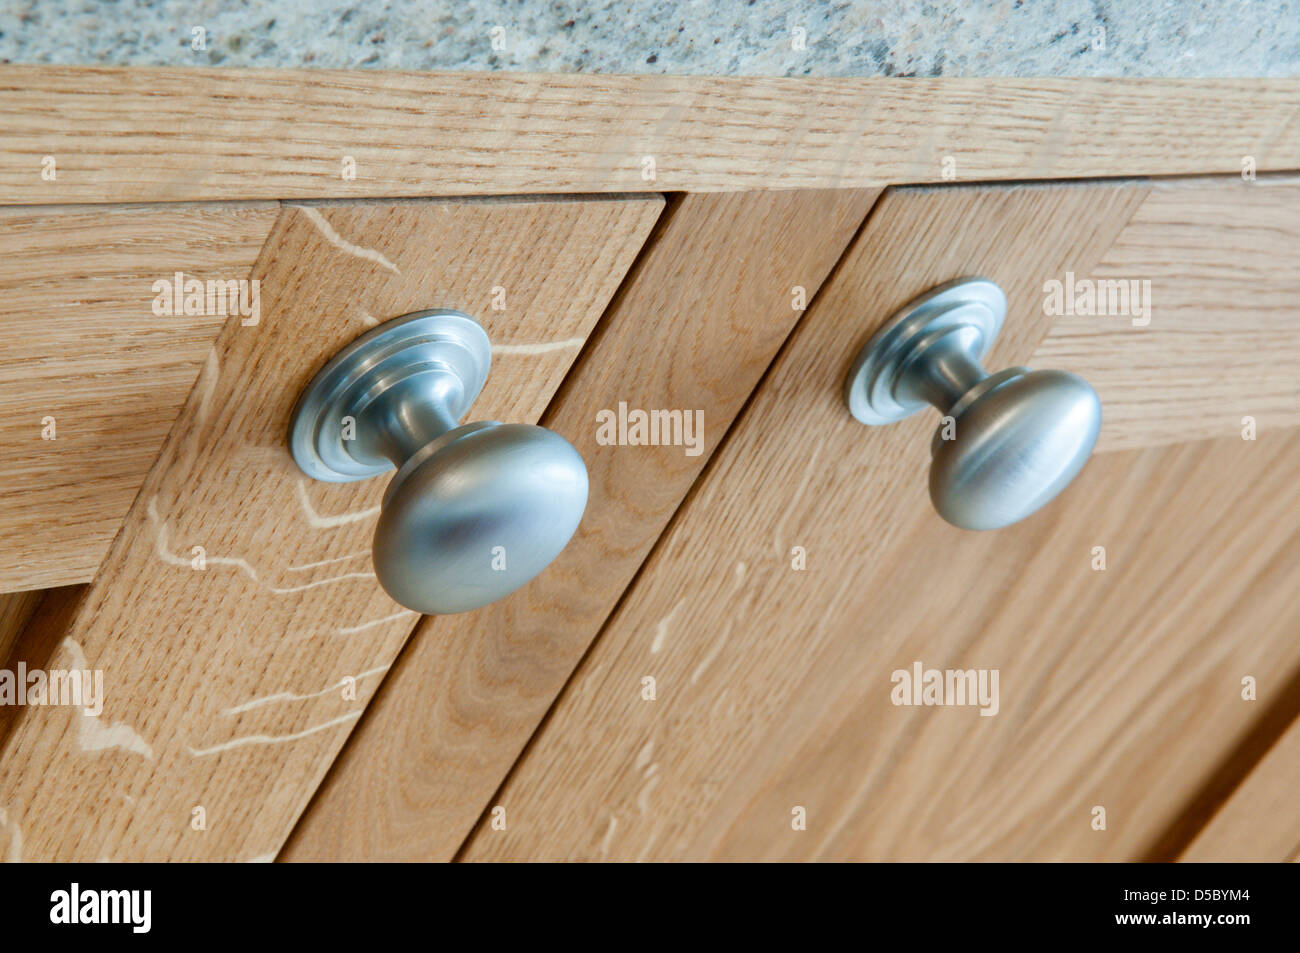 Cupboard Handles Stock Photos & Cupboard Handles Stock Images - Alamy